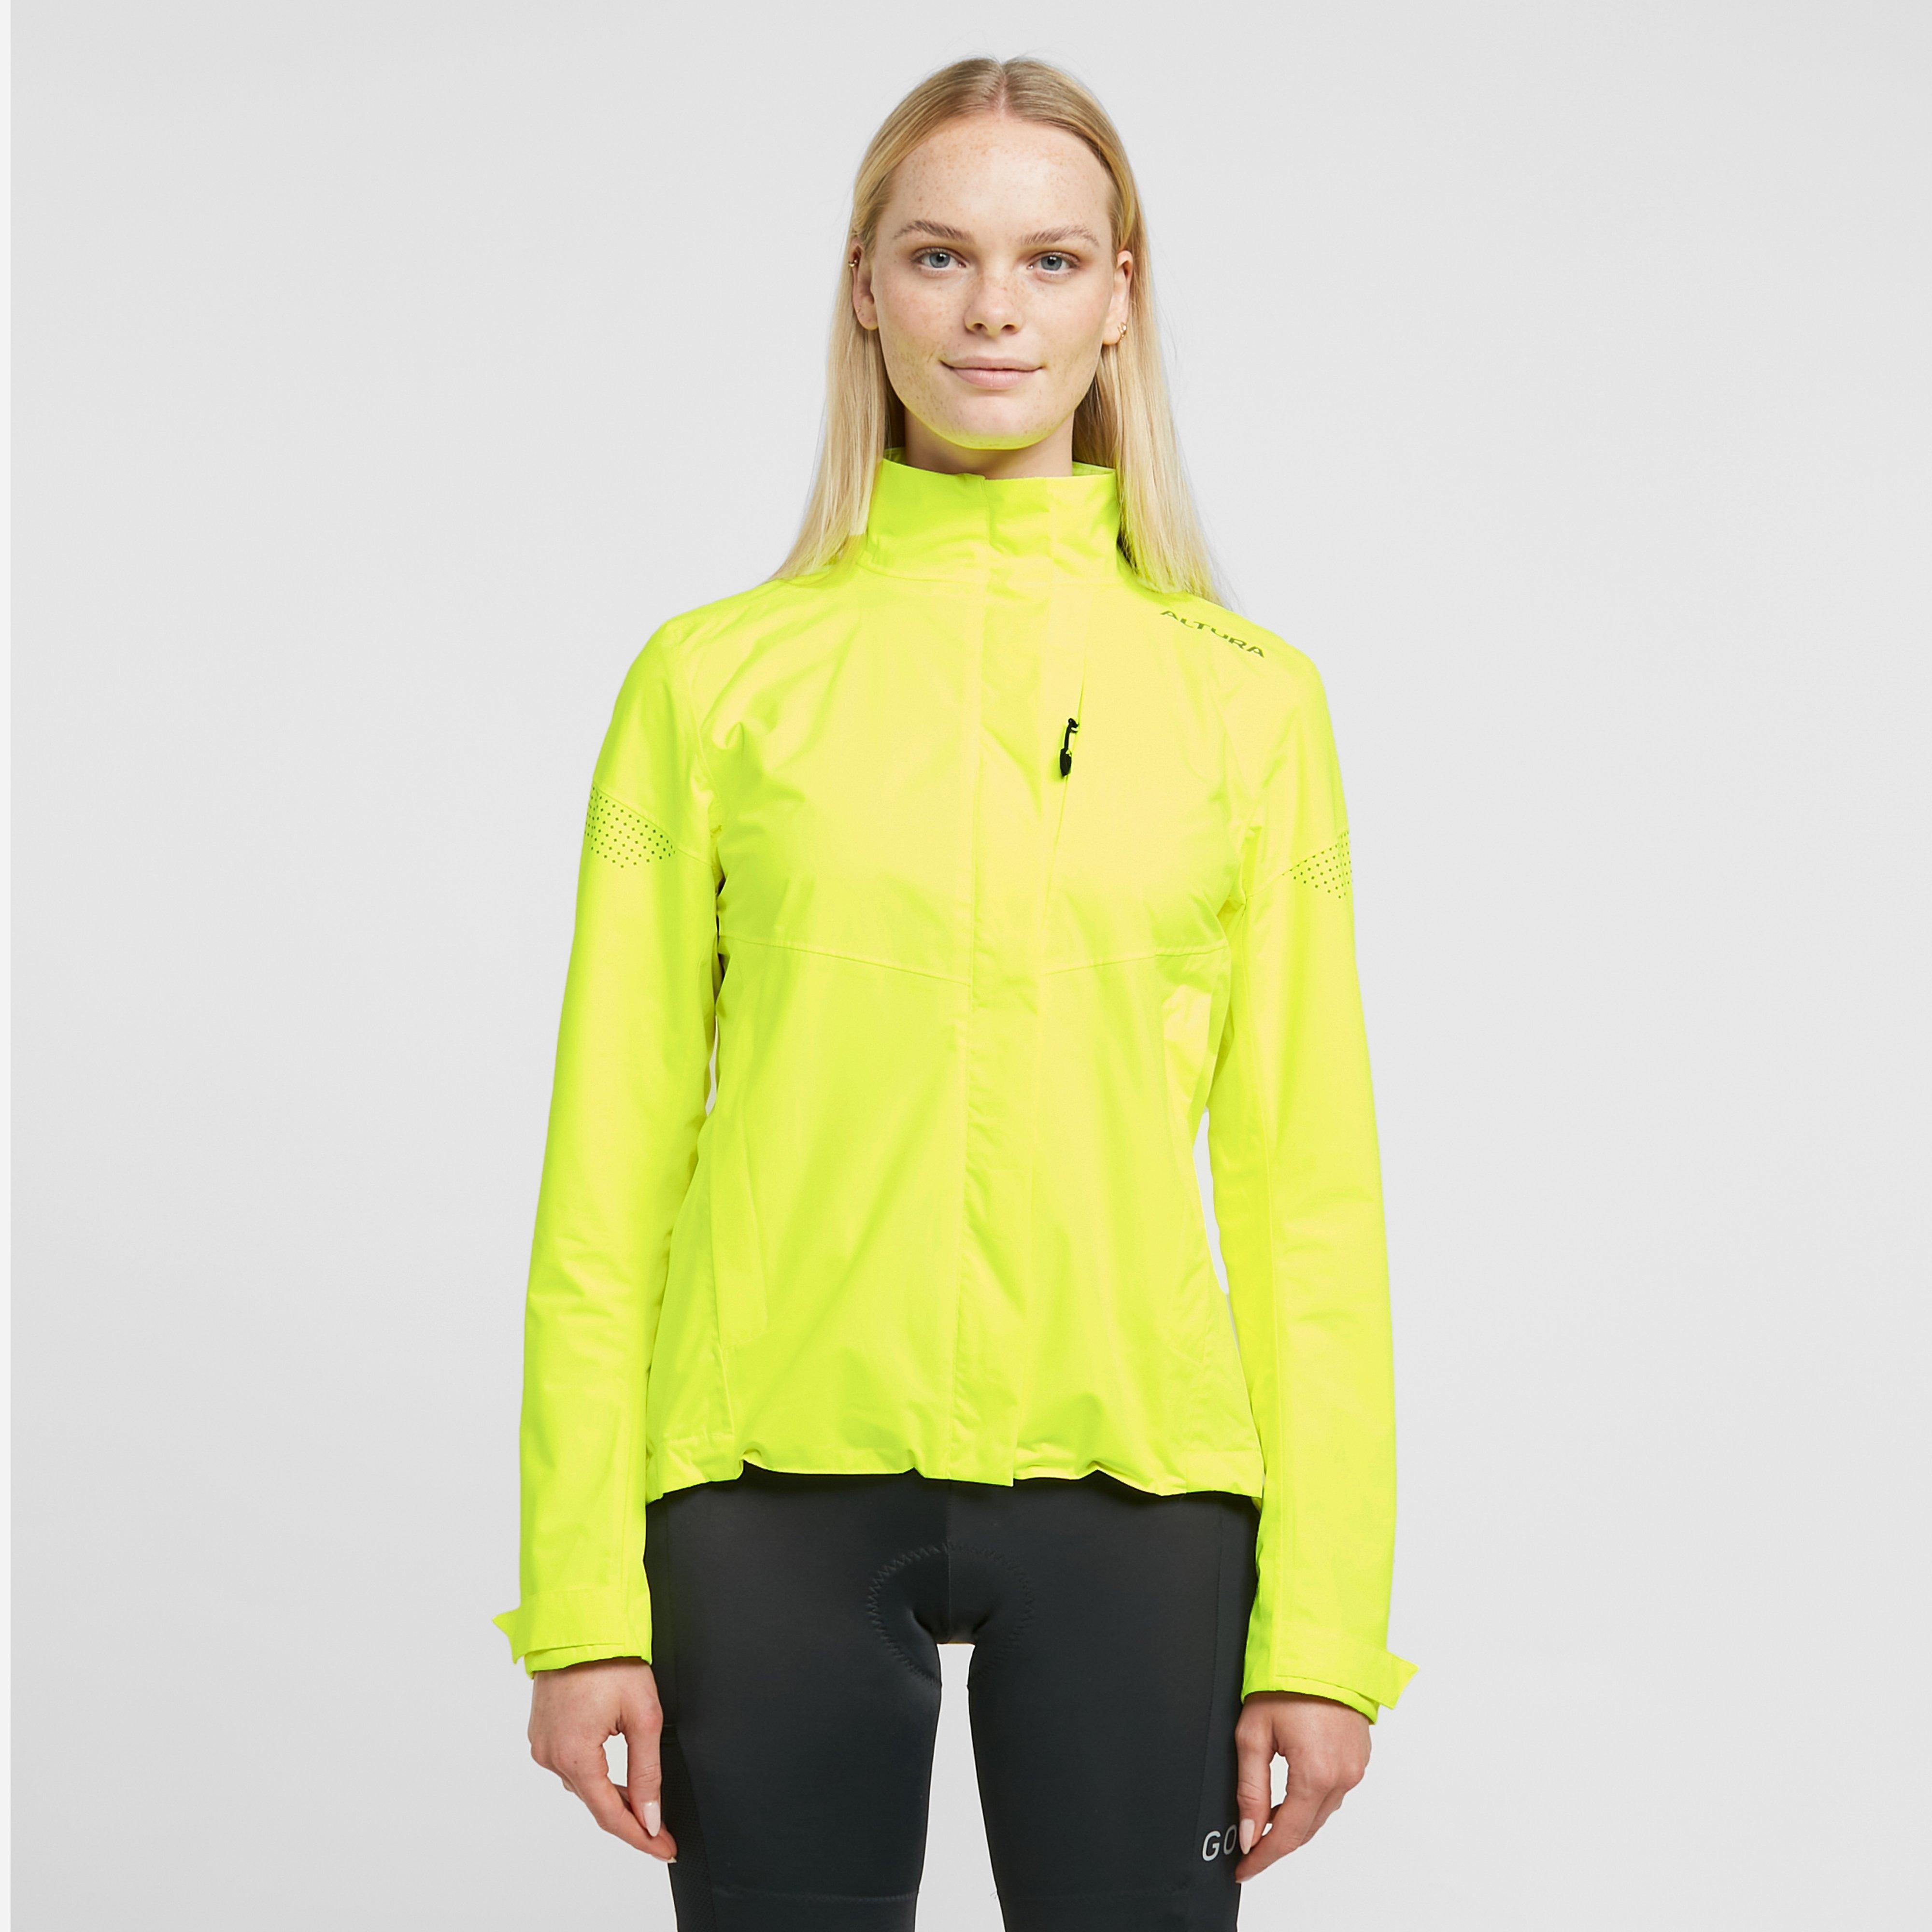 Image of Altura Women's Nevis Nightvision Waterproof Jacket - Yellow/Yel, Yellow/YEL